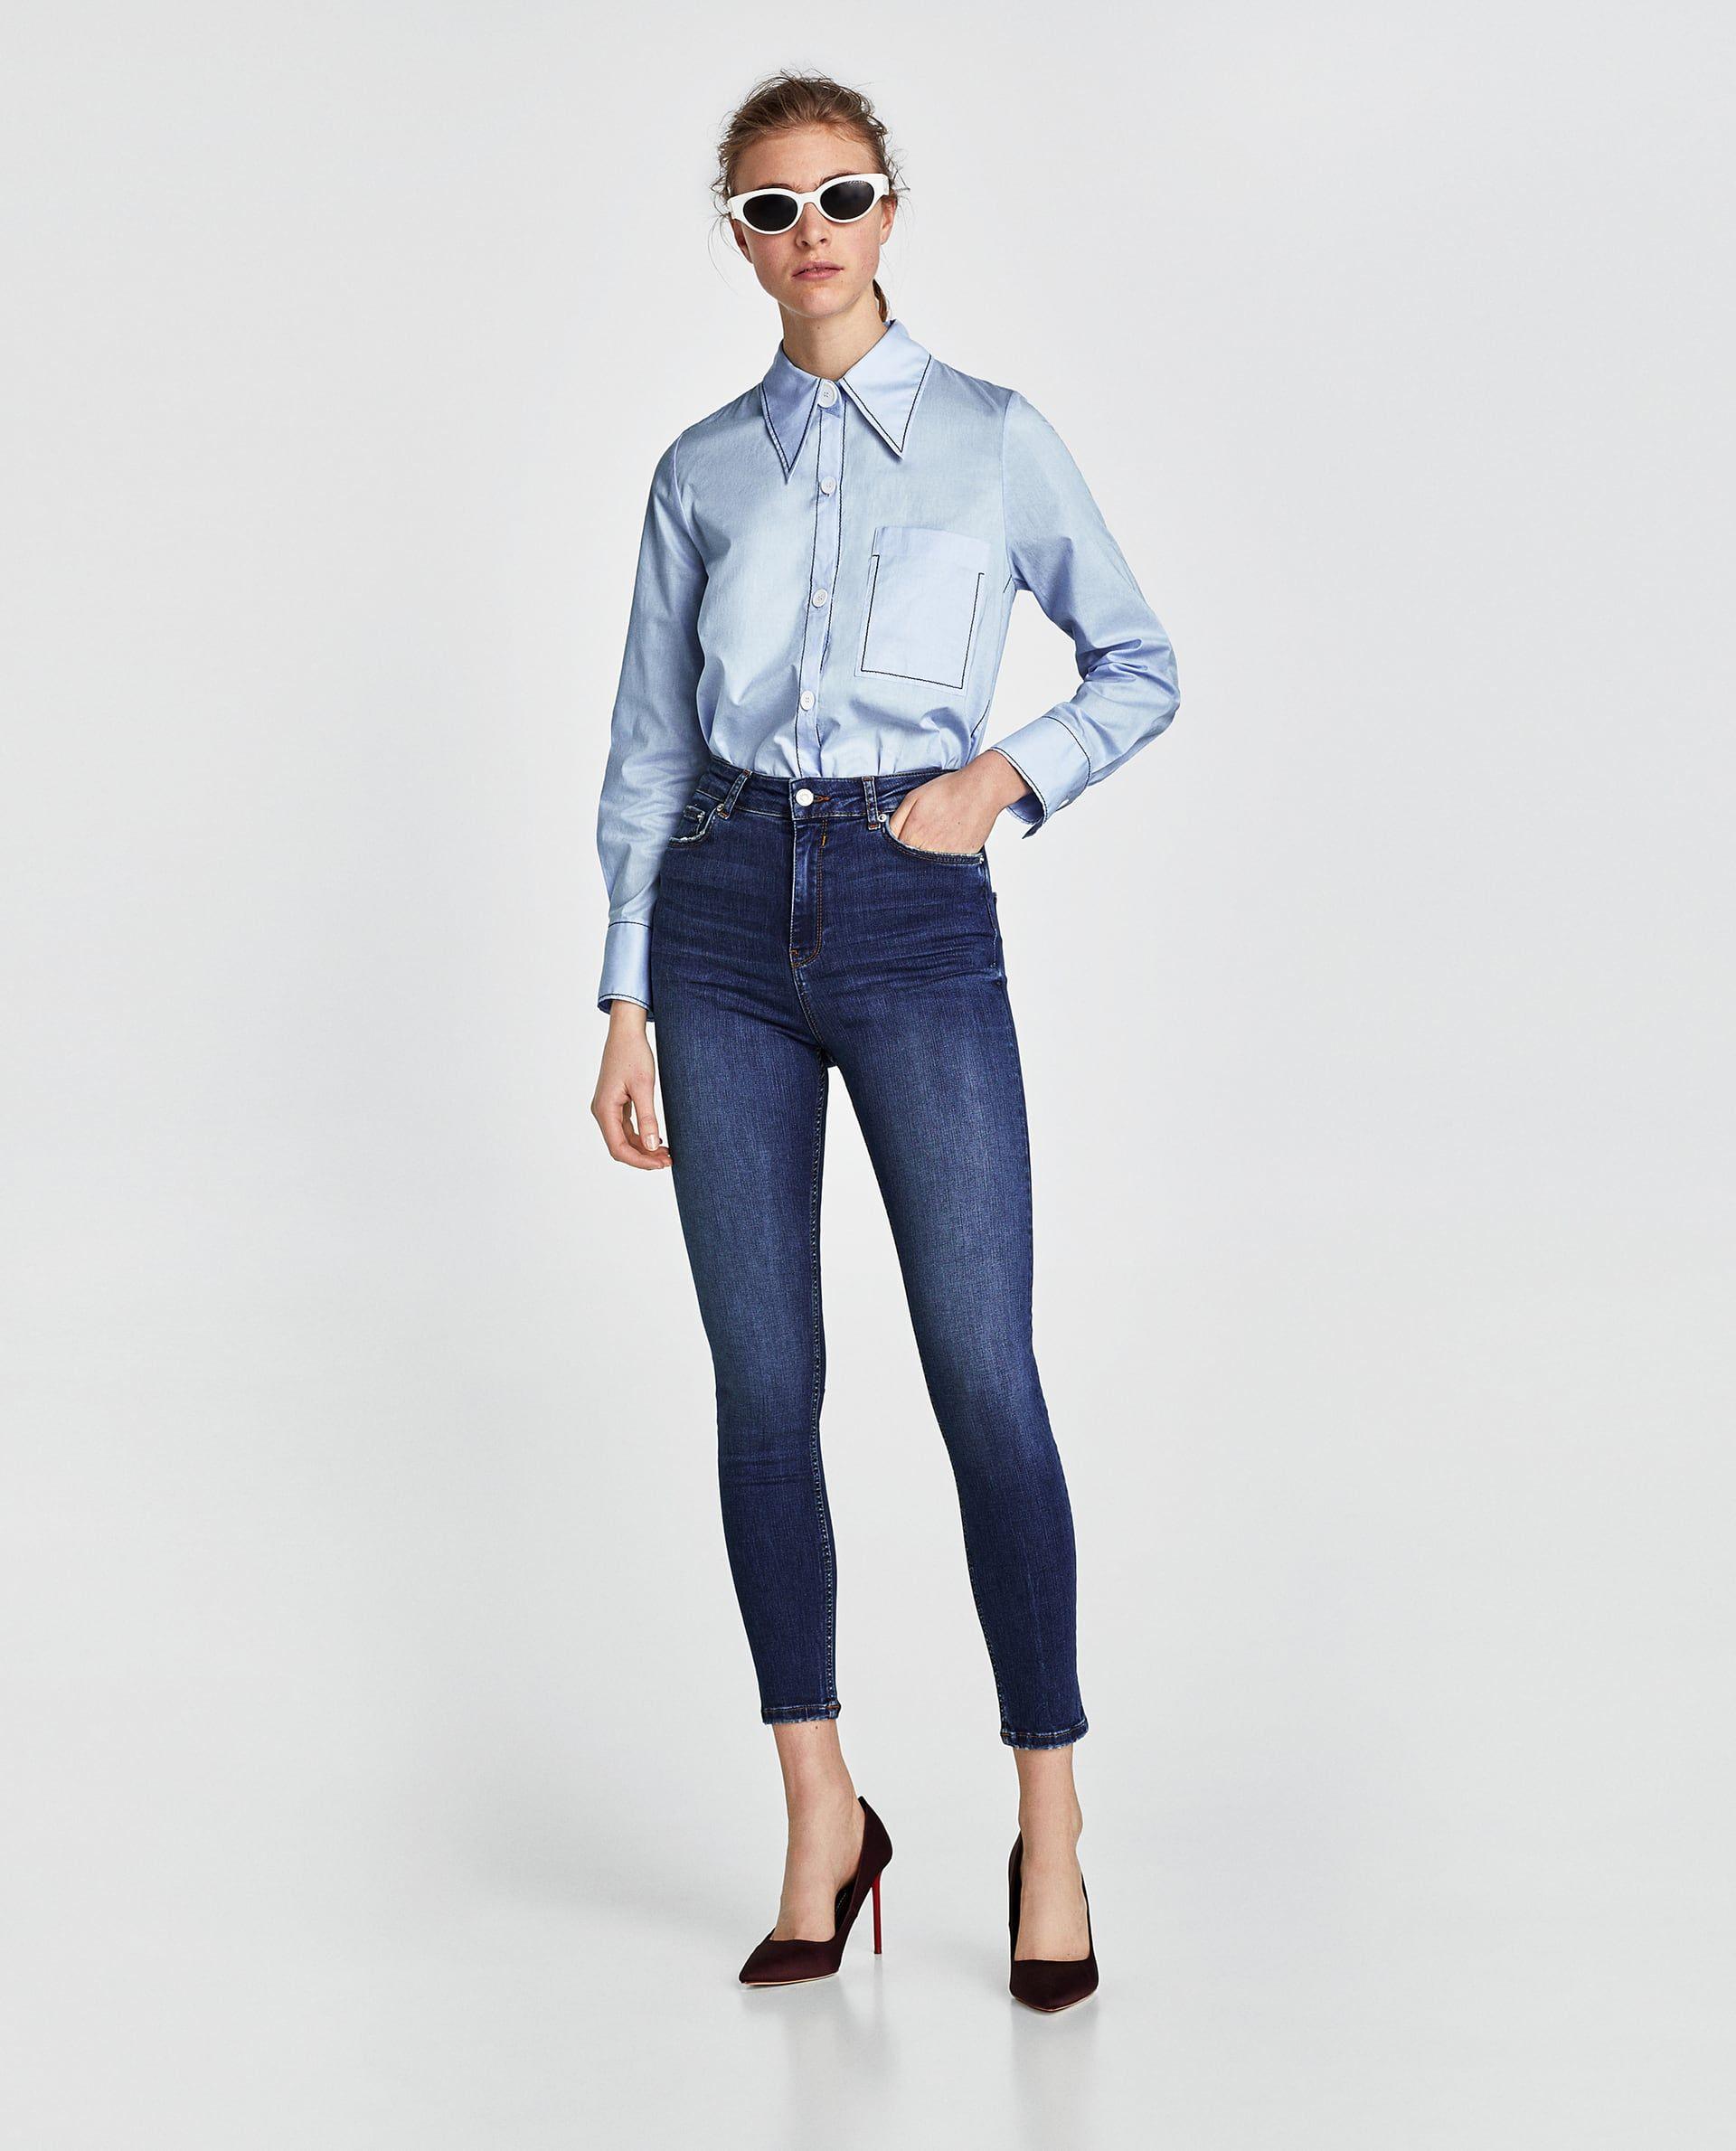 61affc68 JEANS HIGH WAIST NICOLE BLUE | Zara | High waist jeans, Zara jeans ...